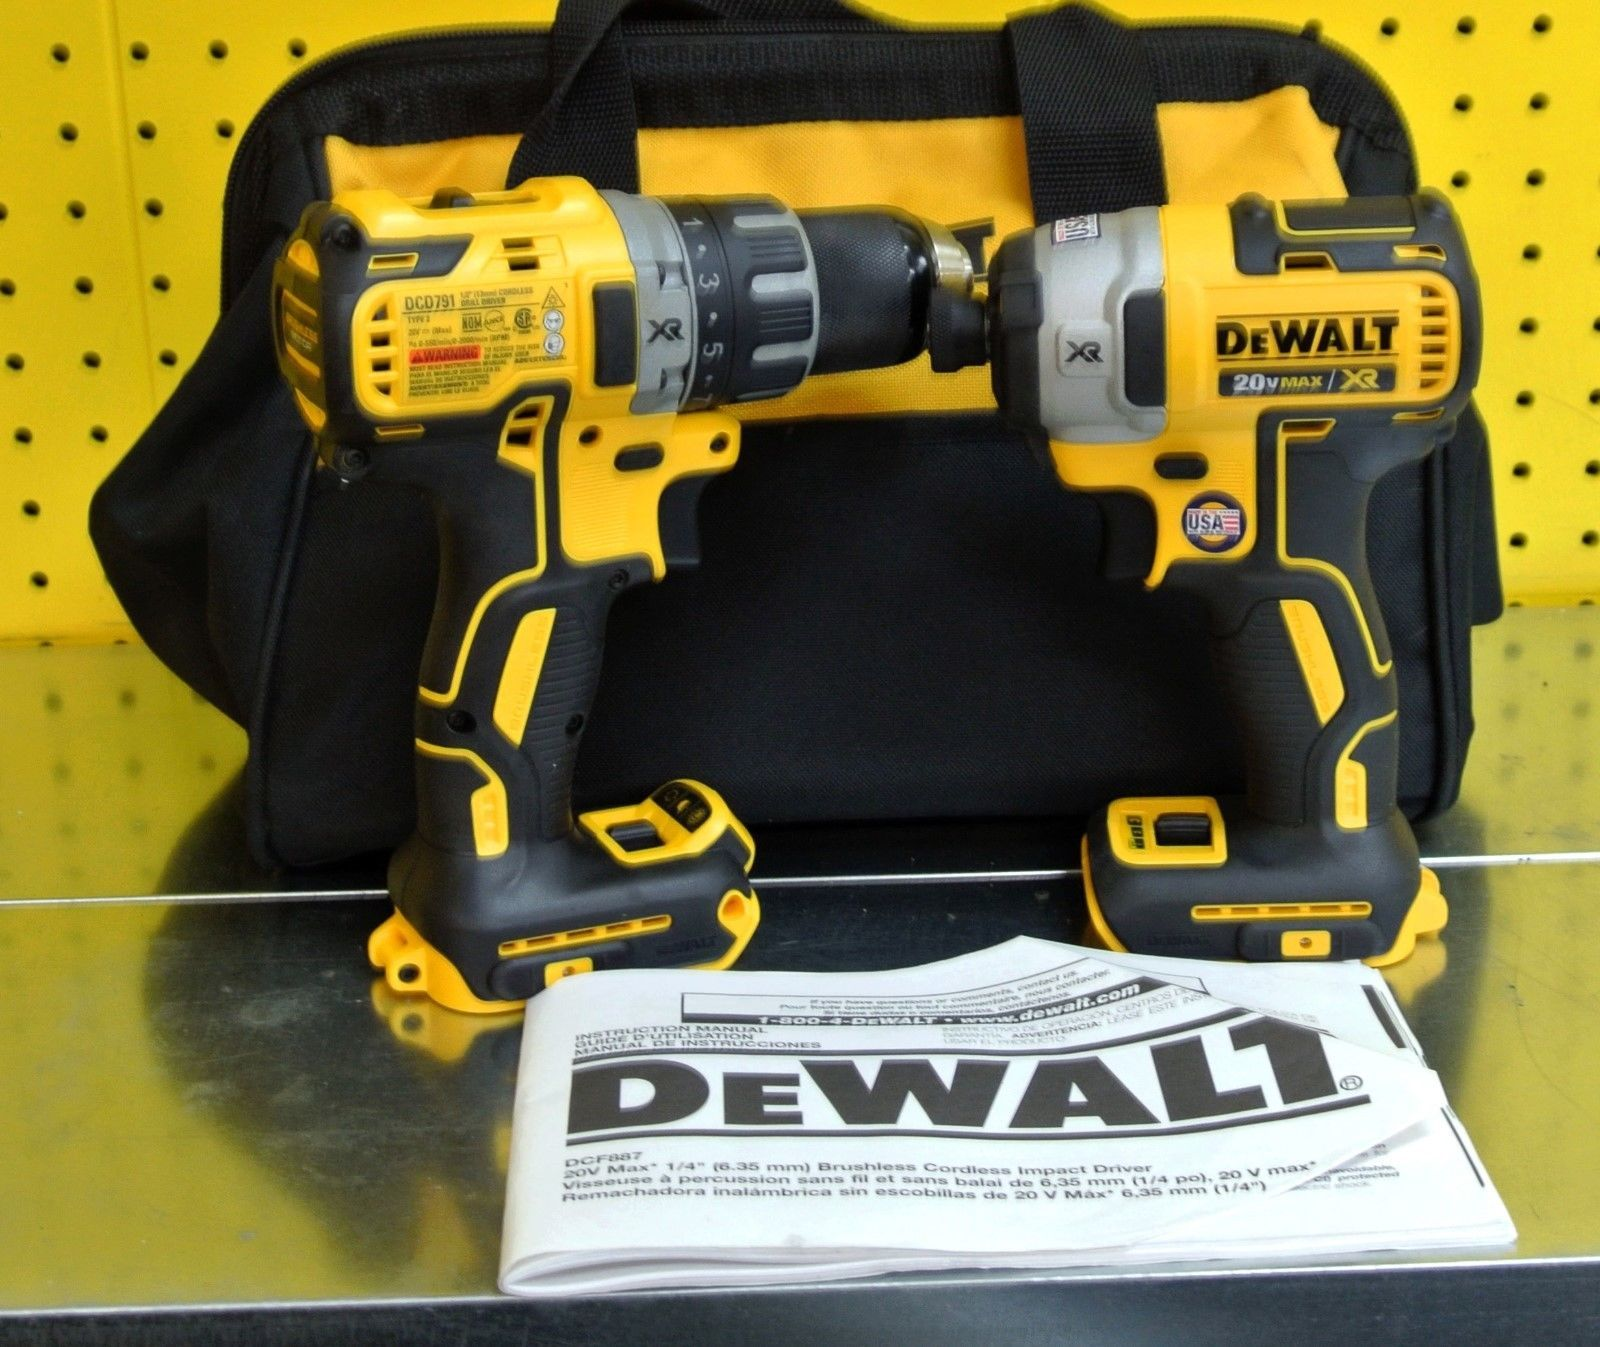 DeWalt 20V combination set CDF887 impact driver DCD791 cordless drill driver https://t.co/xPABTVT1PR https://t.co/EVgiRmwzYV